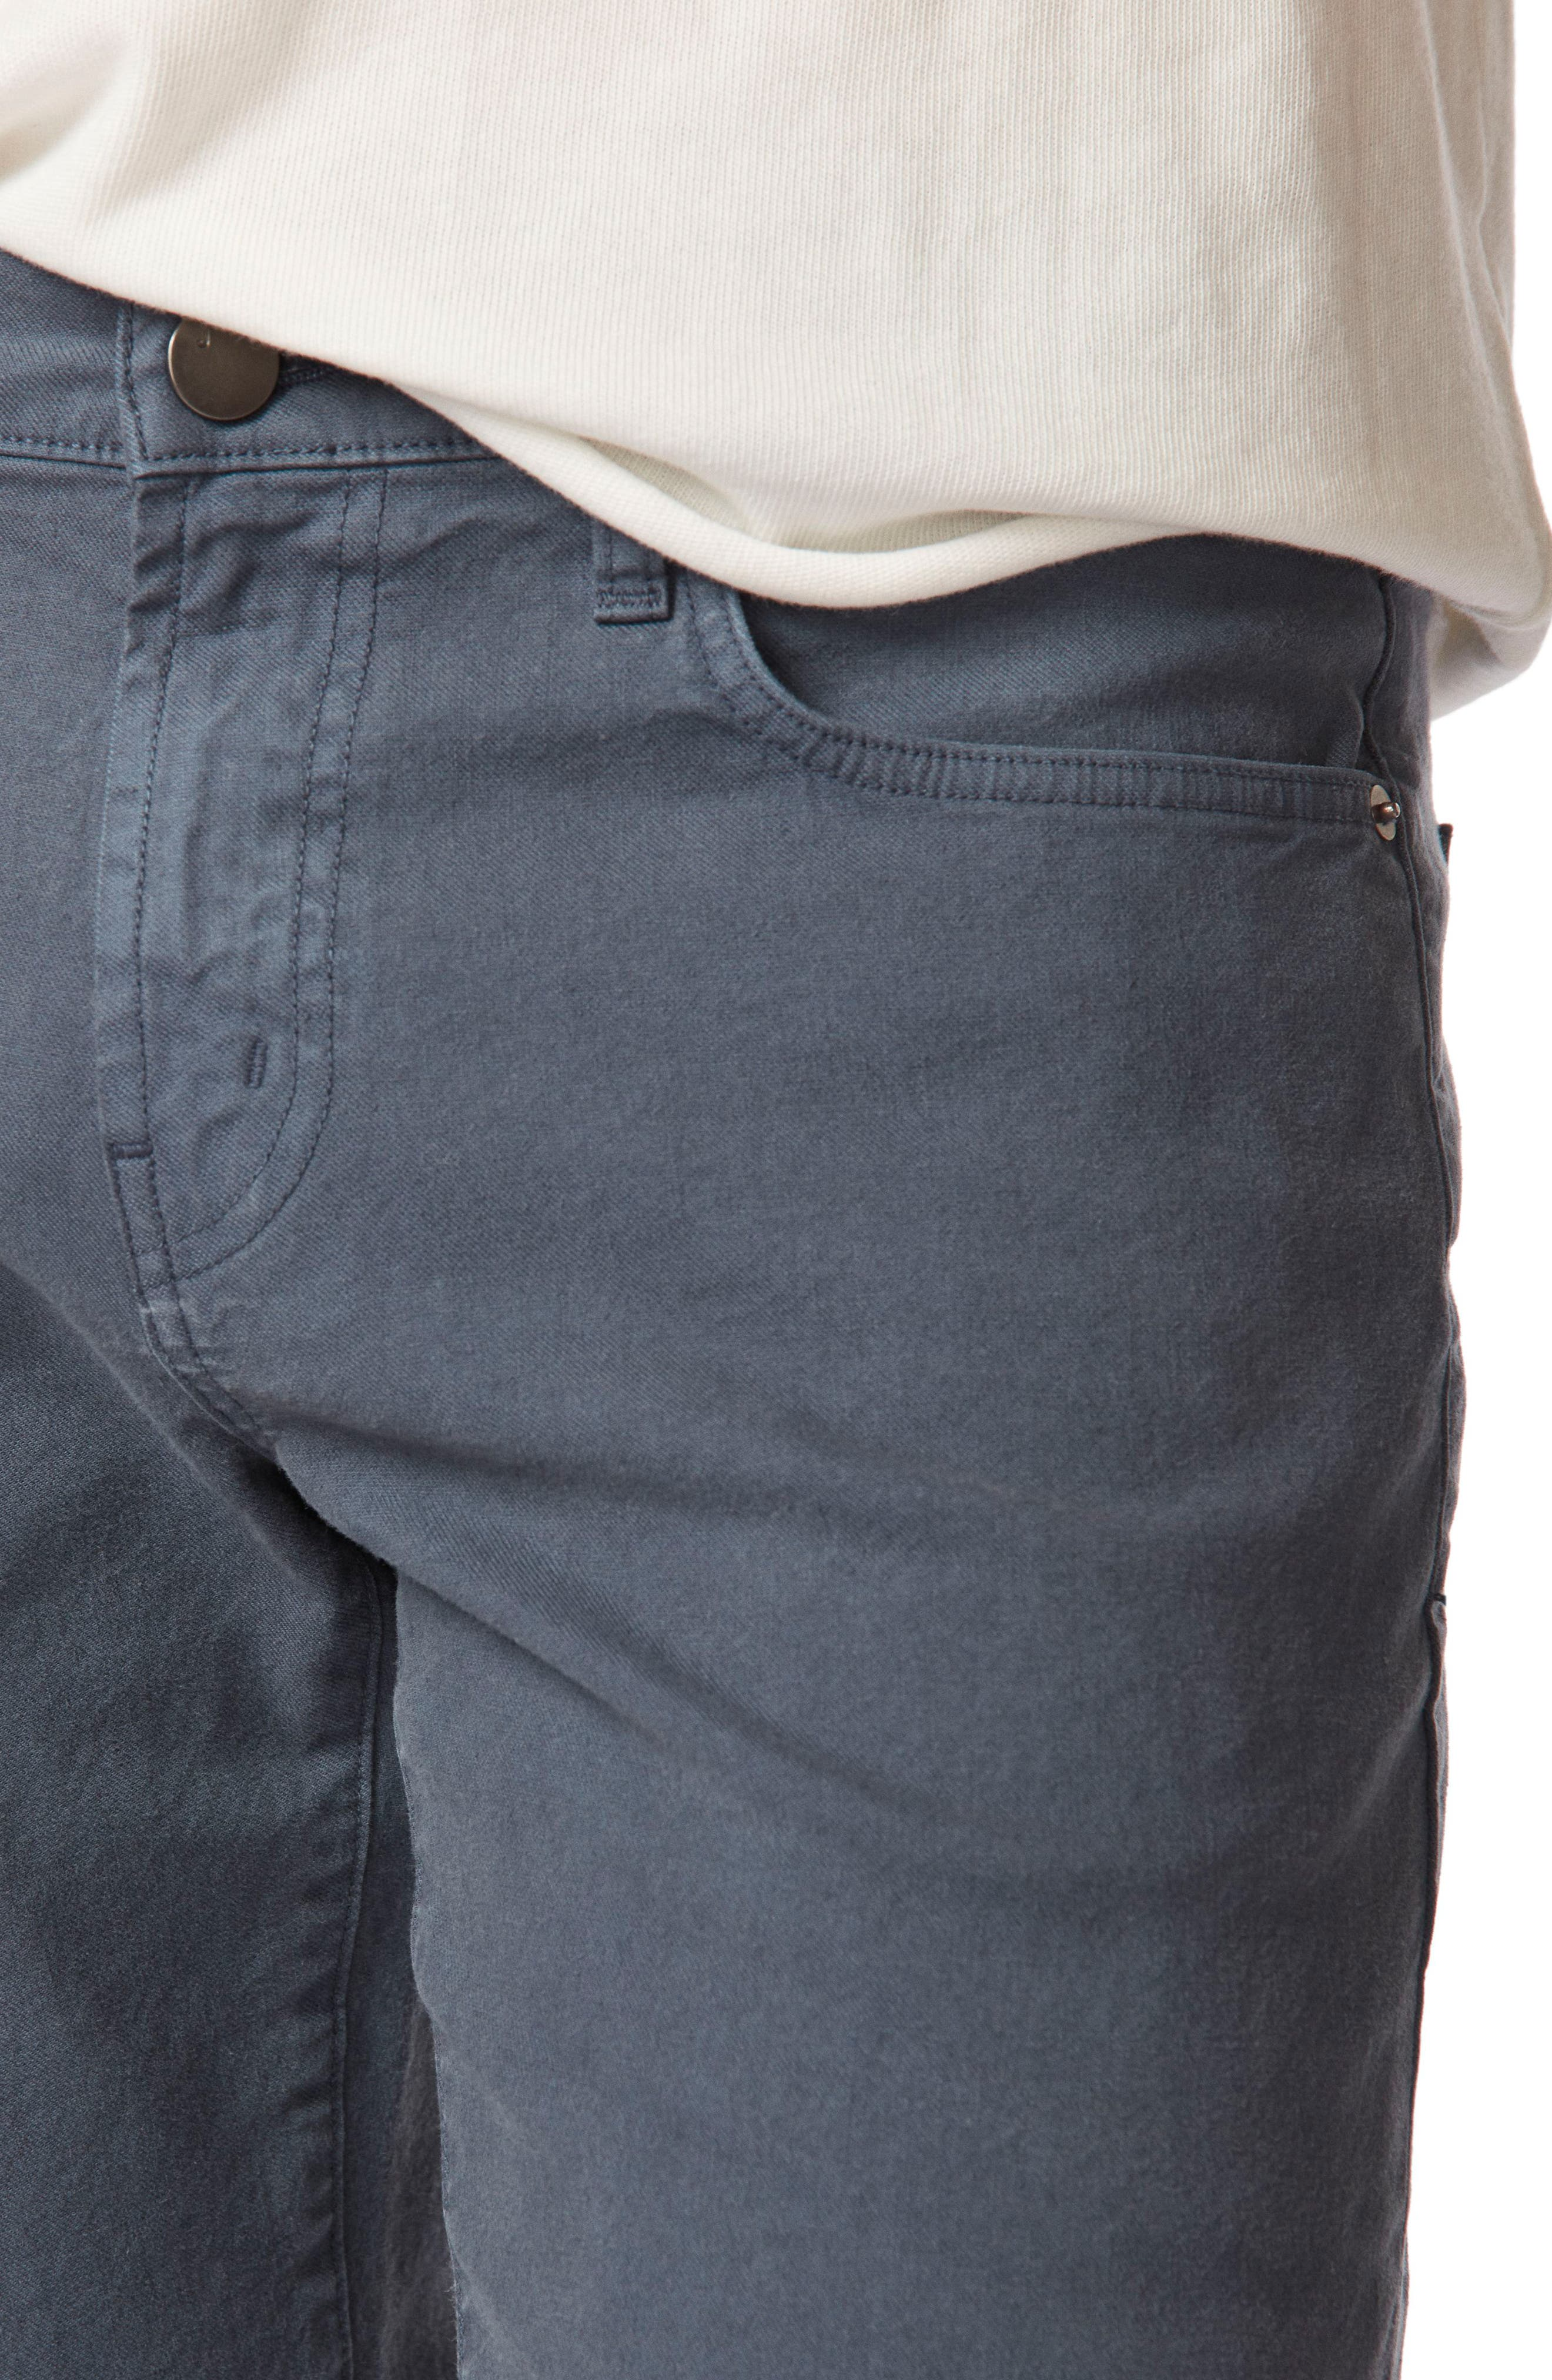 Kane Straight Fit Pant,                             Alternate thumbnail 4, color,                             Tilite